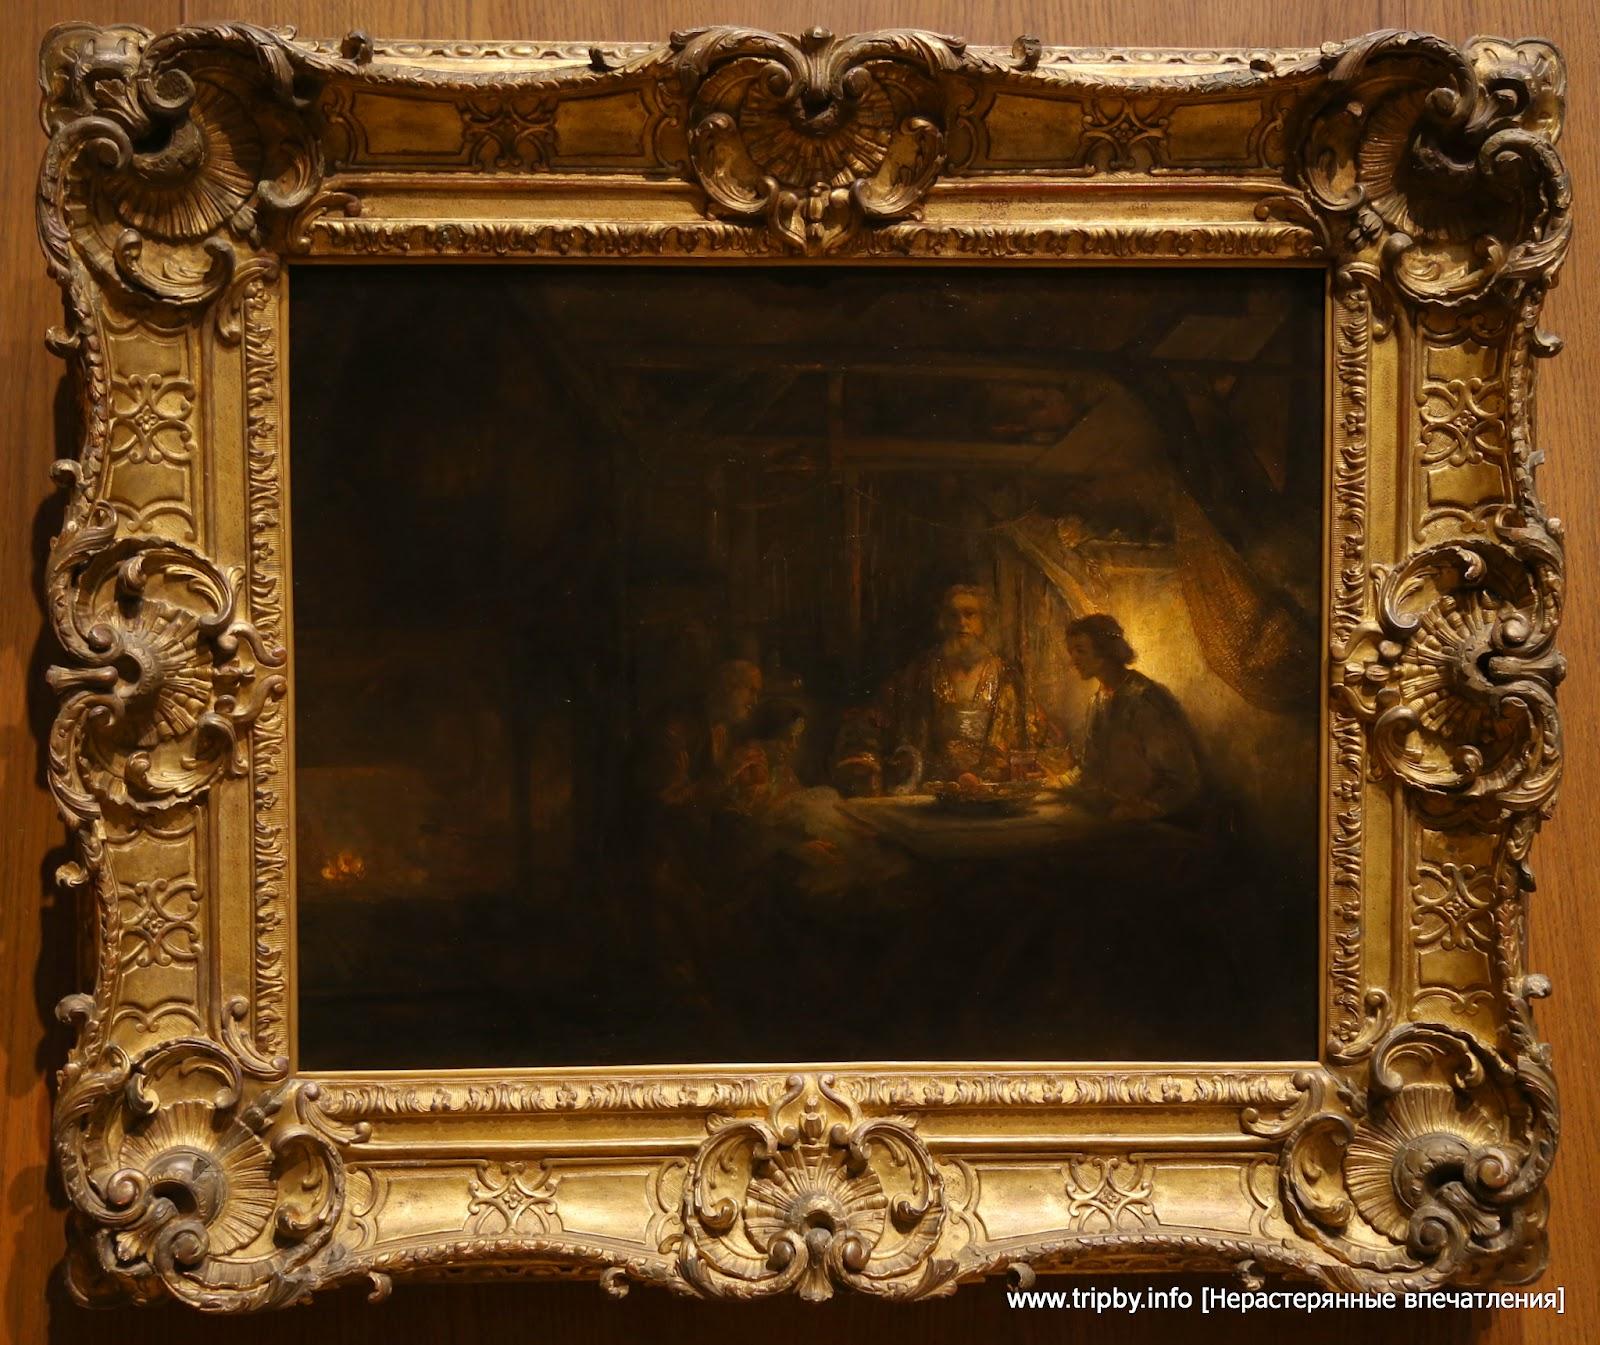 Rembrandt van Rijn Dutch, 1606 - 1669 Philemon and Baucis 1658